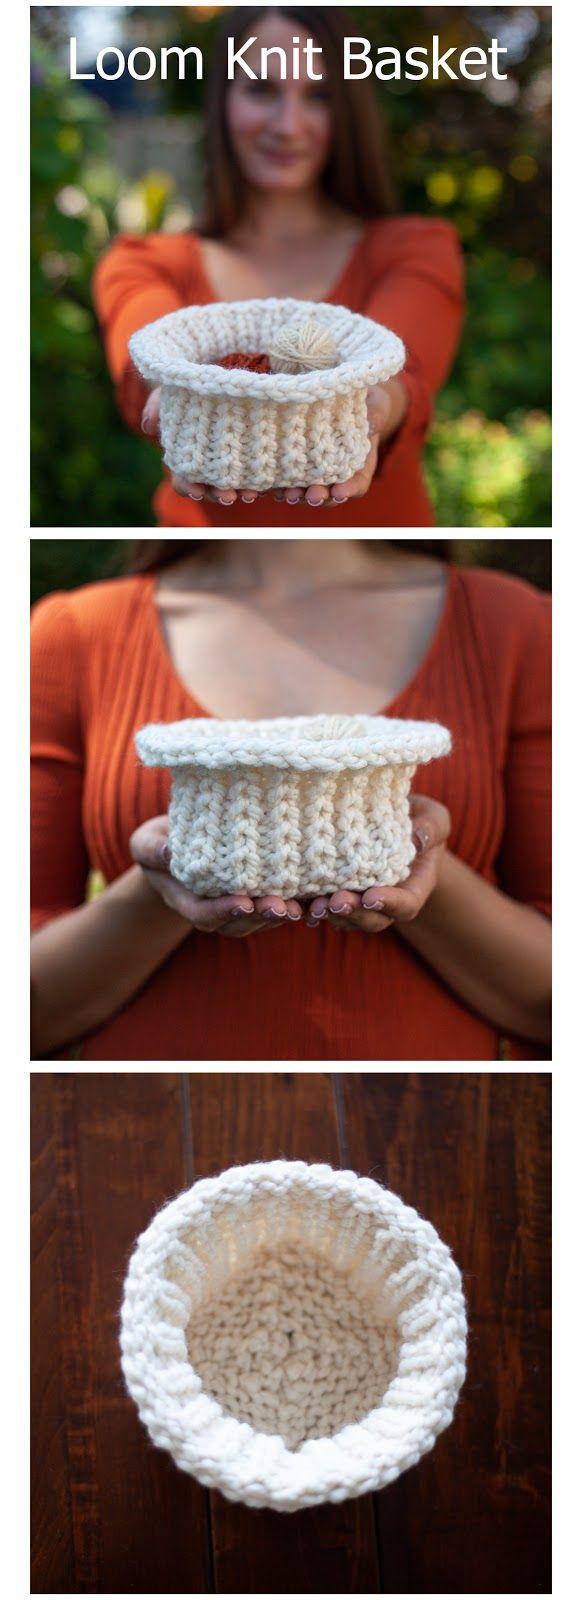 Loom Knit Basket (Free Pattern) #loomknitting